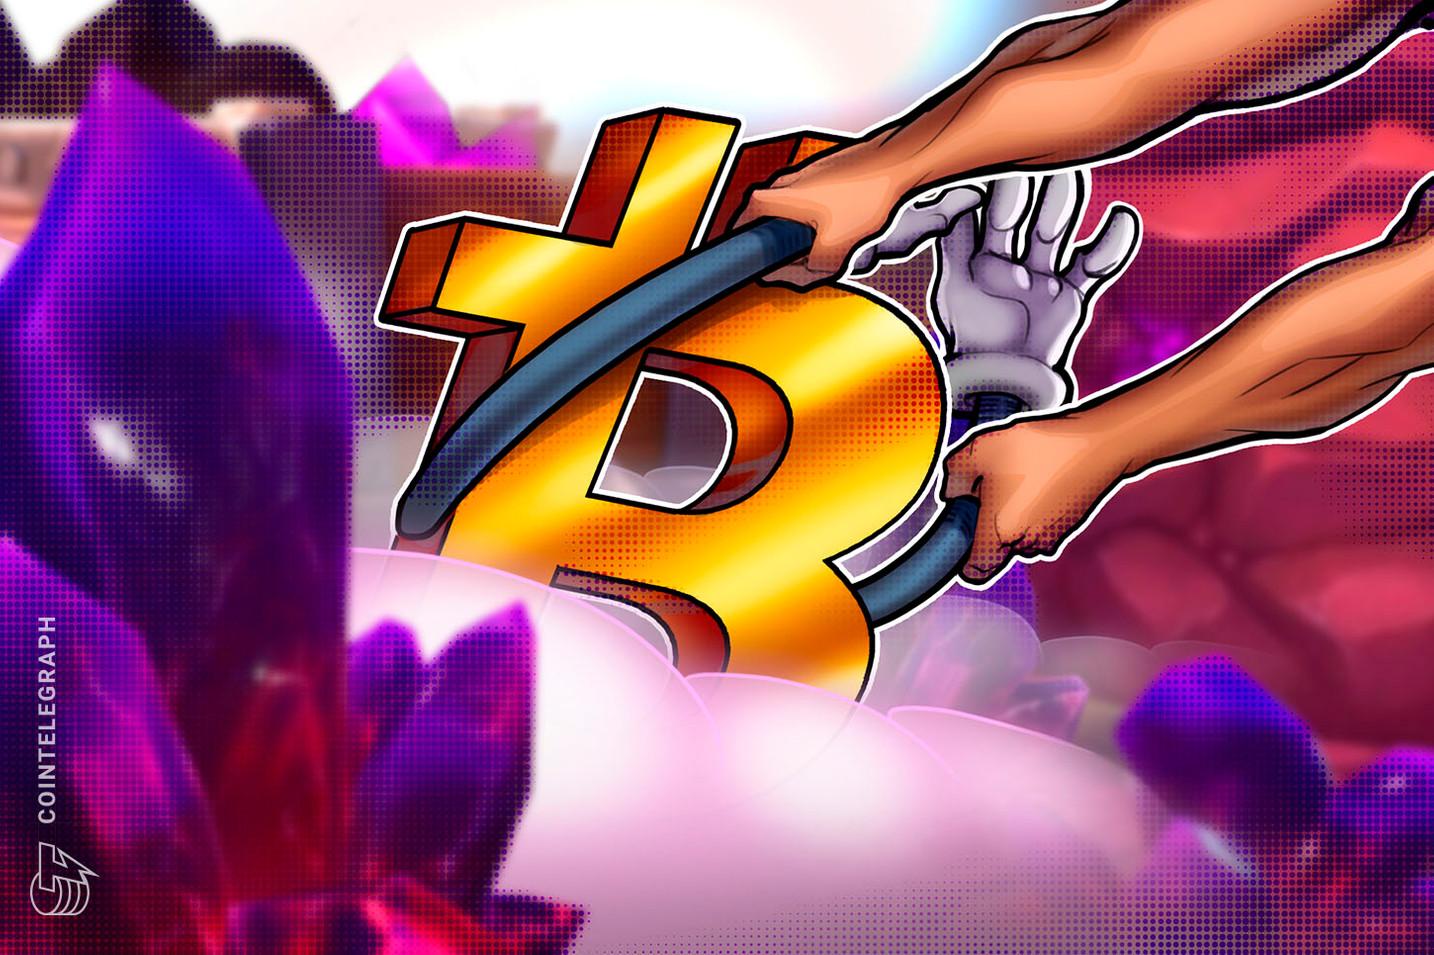 Bitcoin richt zich op $ 36K key Wyckoff-niveau met altcoins ingesteld om 'zwaarder te malen'